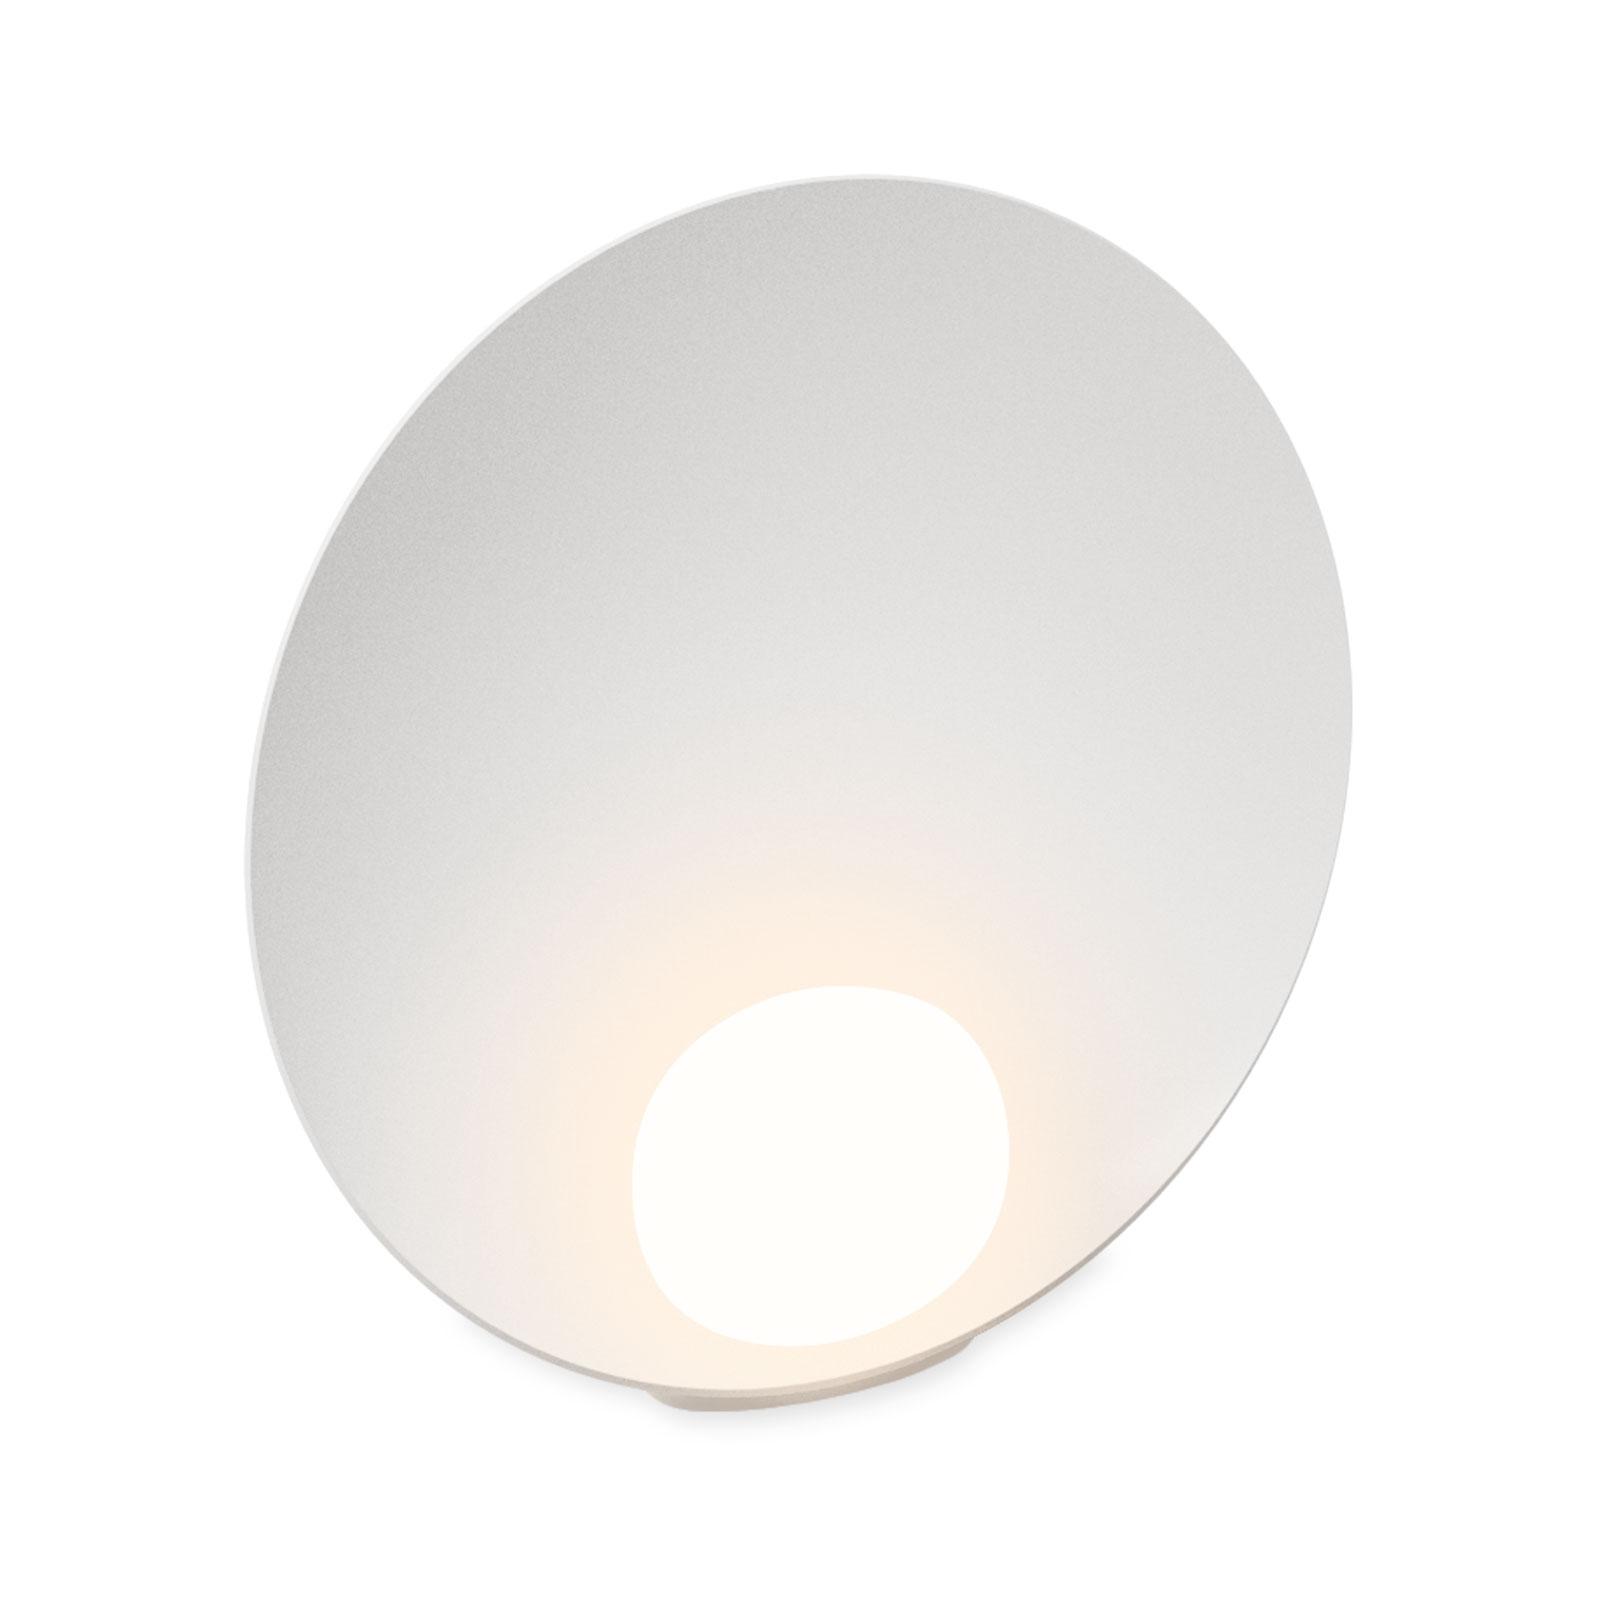 Vibia Musa 7400 LED tafellamp staand, wit